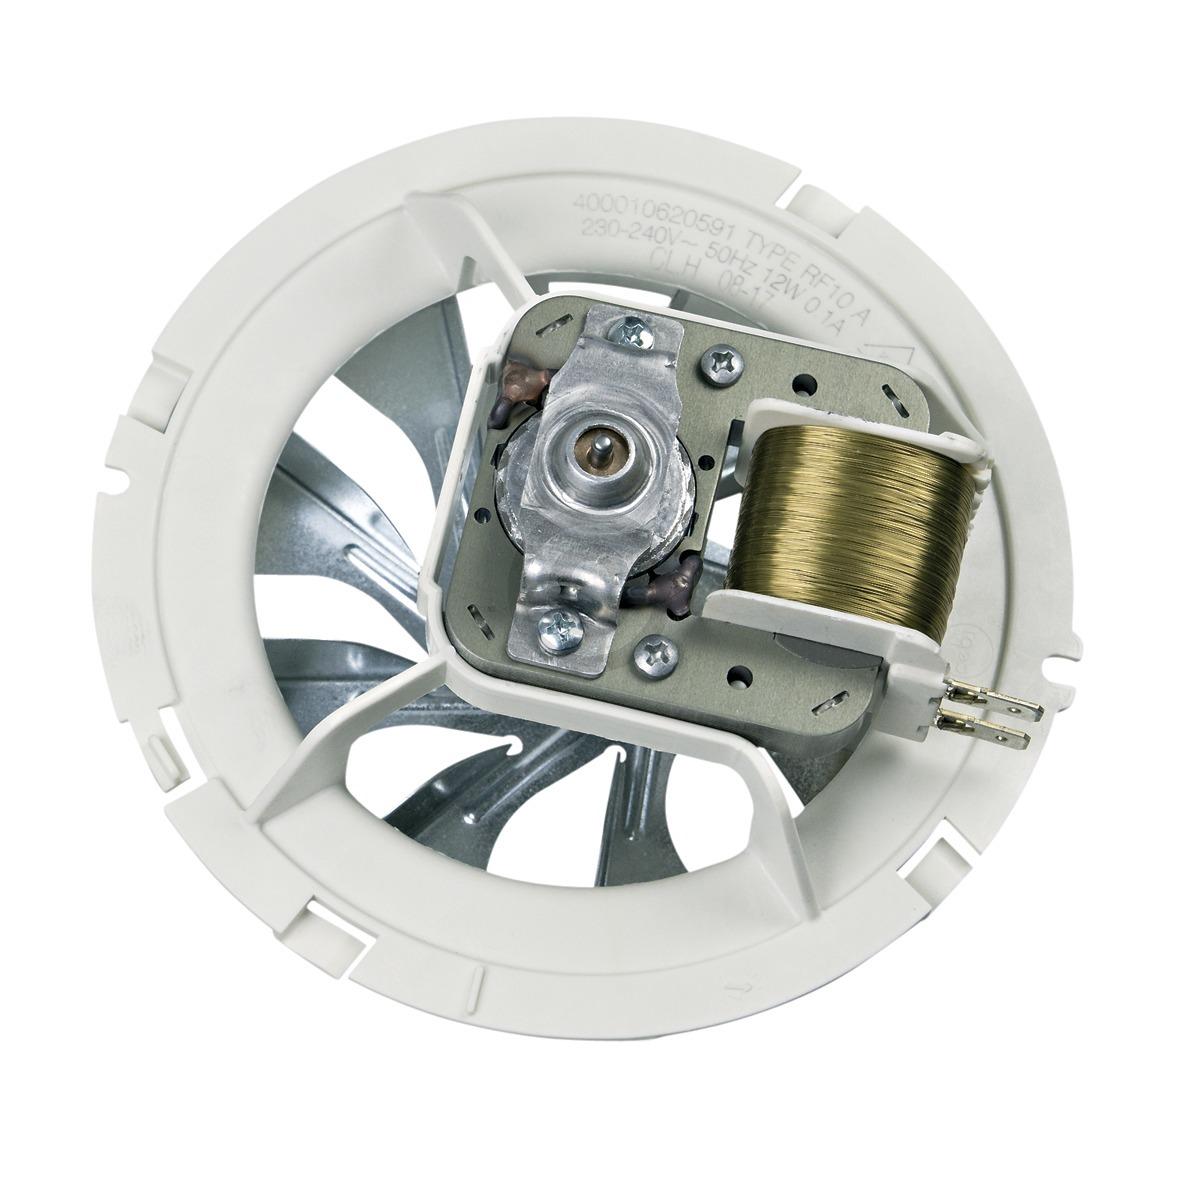 Heißluftherdventilator kpl. 480121103444 Indesit Hotpoint, Bauknecht, Whirlpool,